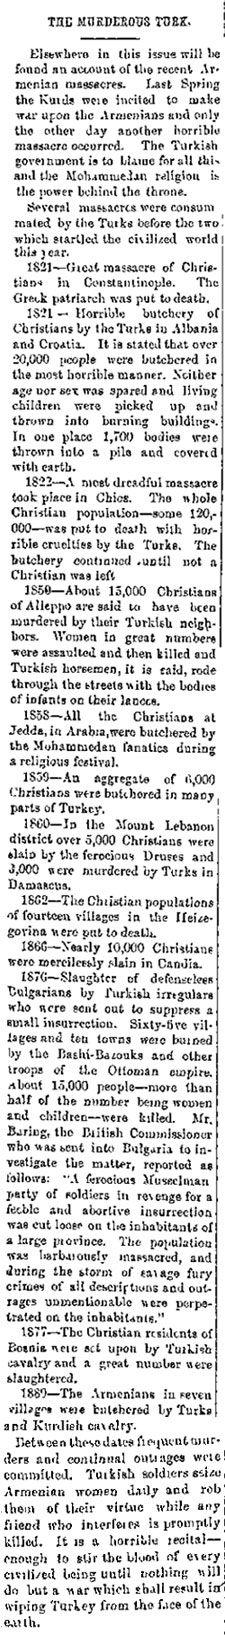 The Murderous Turk. The Utah Journal Newspaper 1895-12-14 www.greek-genocide.net